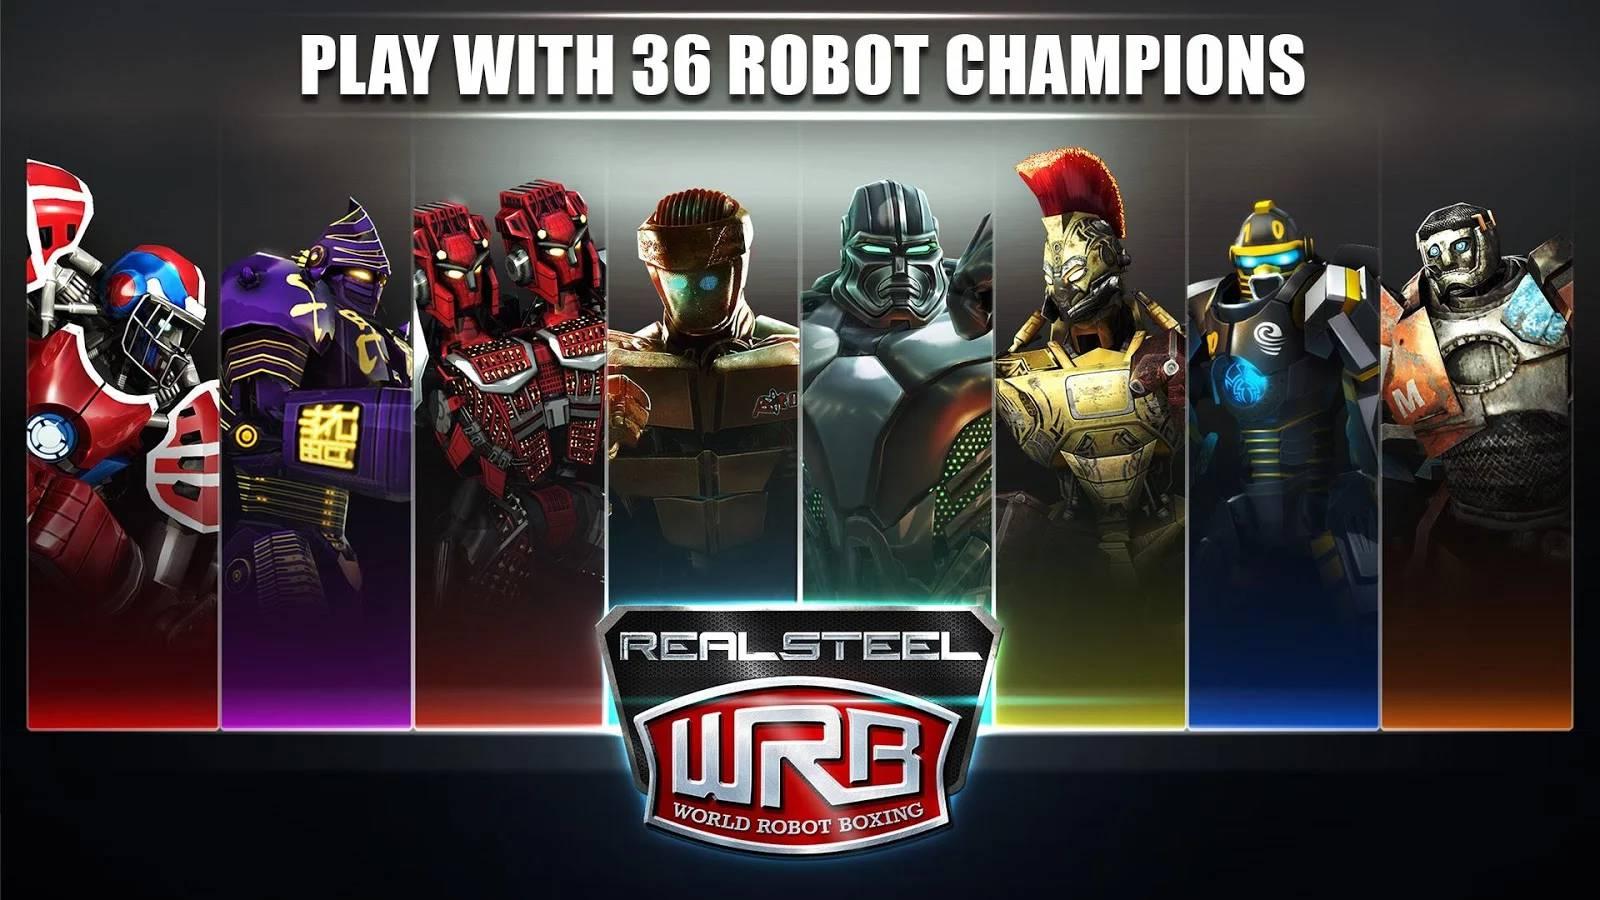 Real Steel World Robot Boxing на андроид скачать бесплатно | Real Steel World Robot Boxing скачать для android телефона, планшета